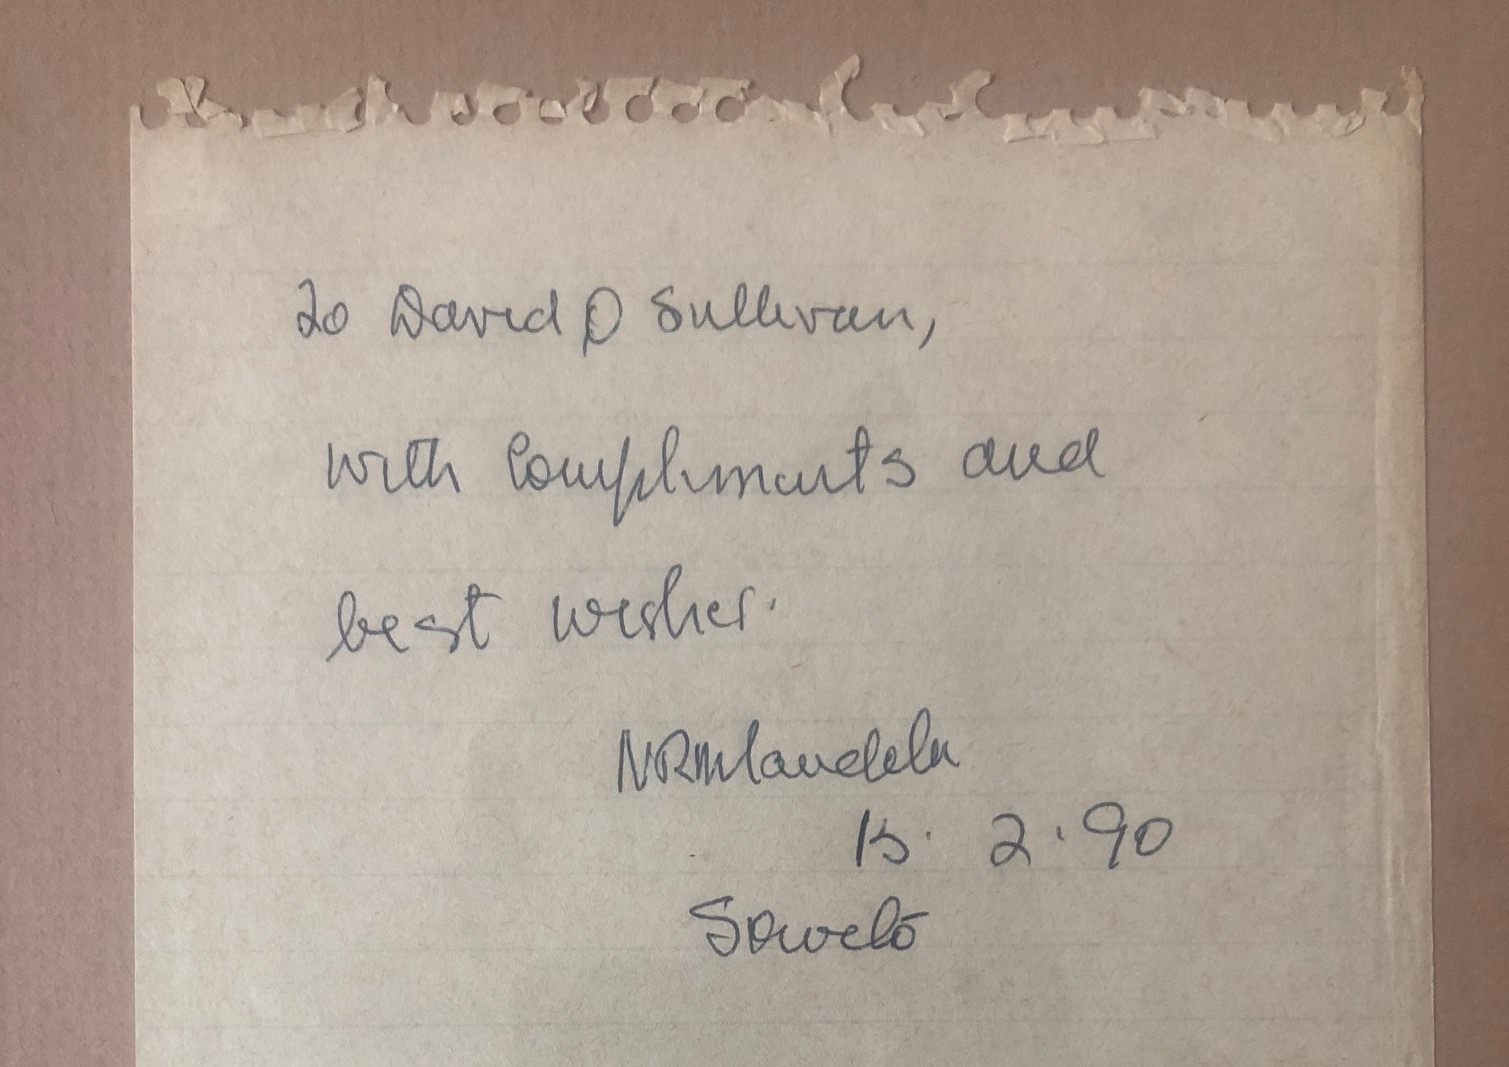 An encounter with President Nelson Mandela